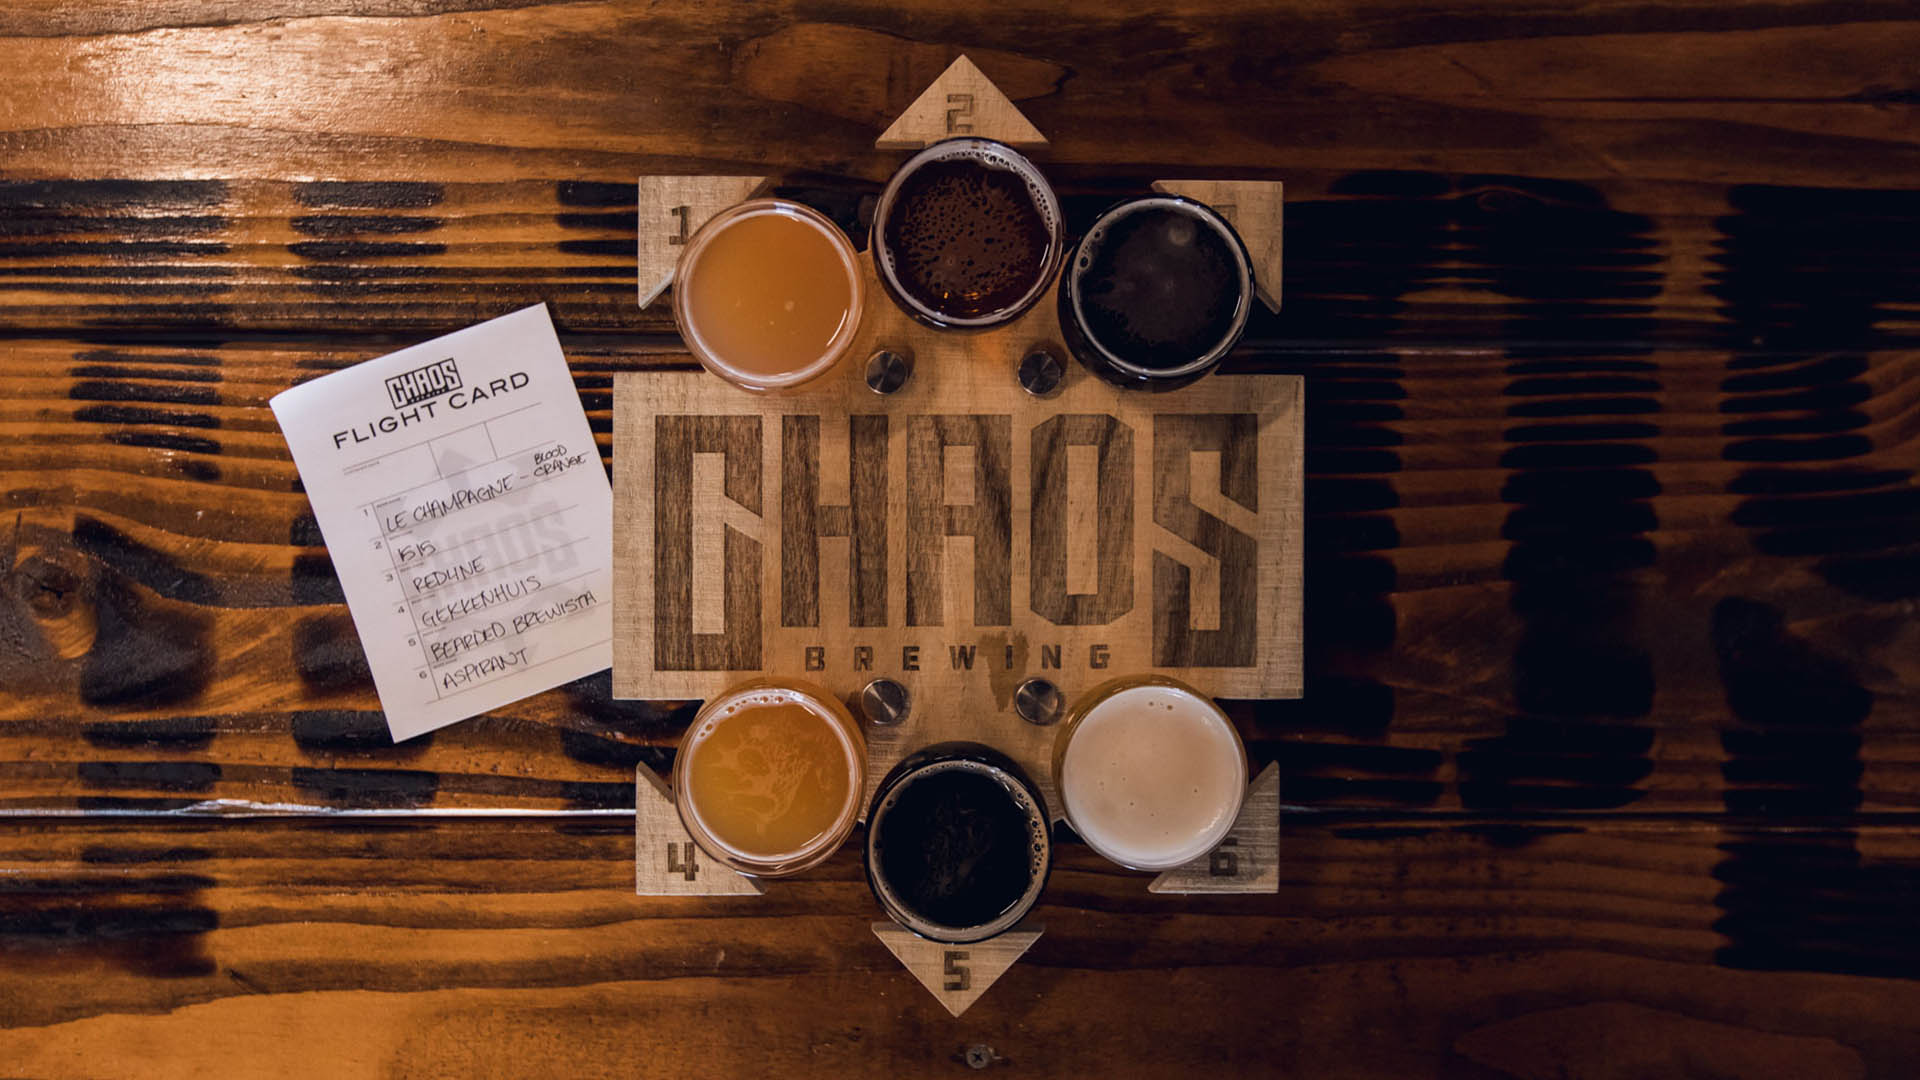 Chaos Brewing Company Commercial Photography Joplin Missouri